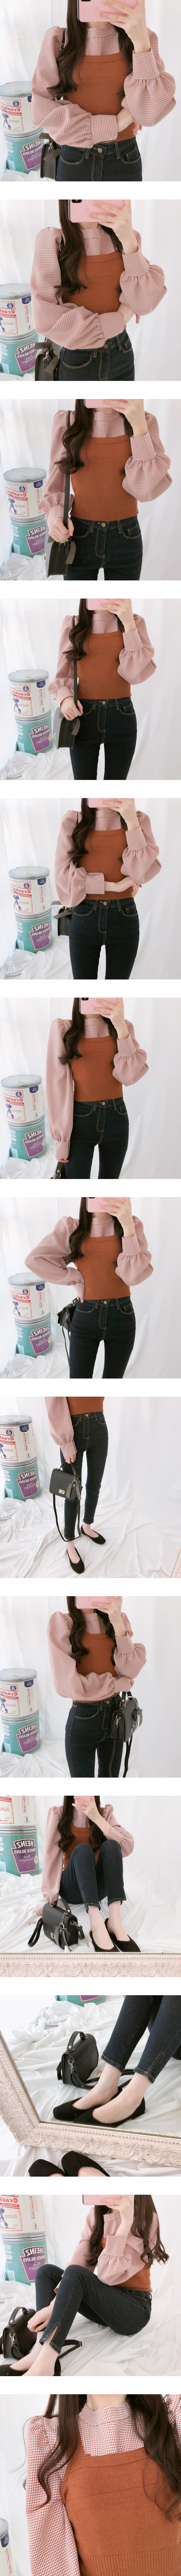 Gobang knit set blouse